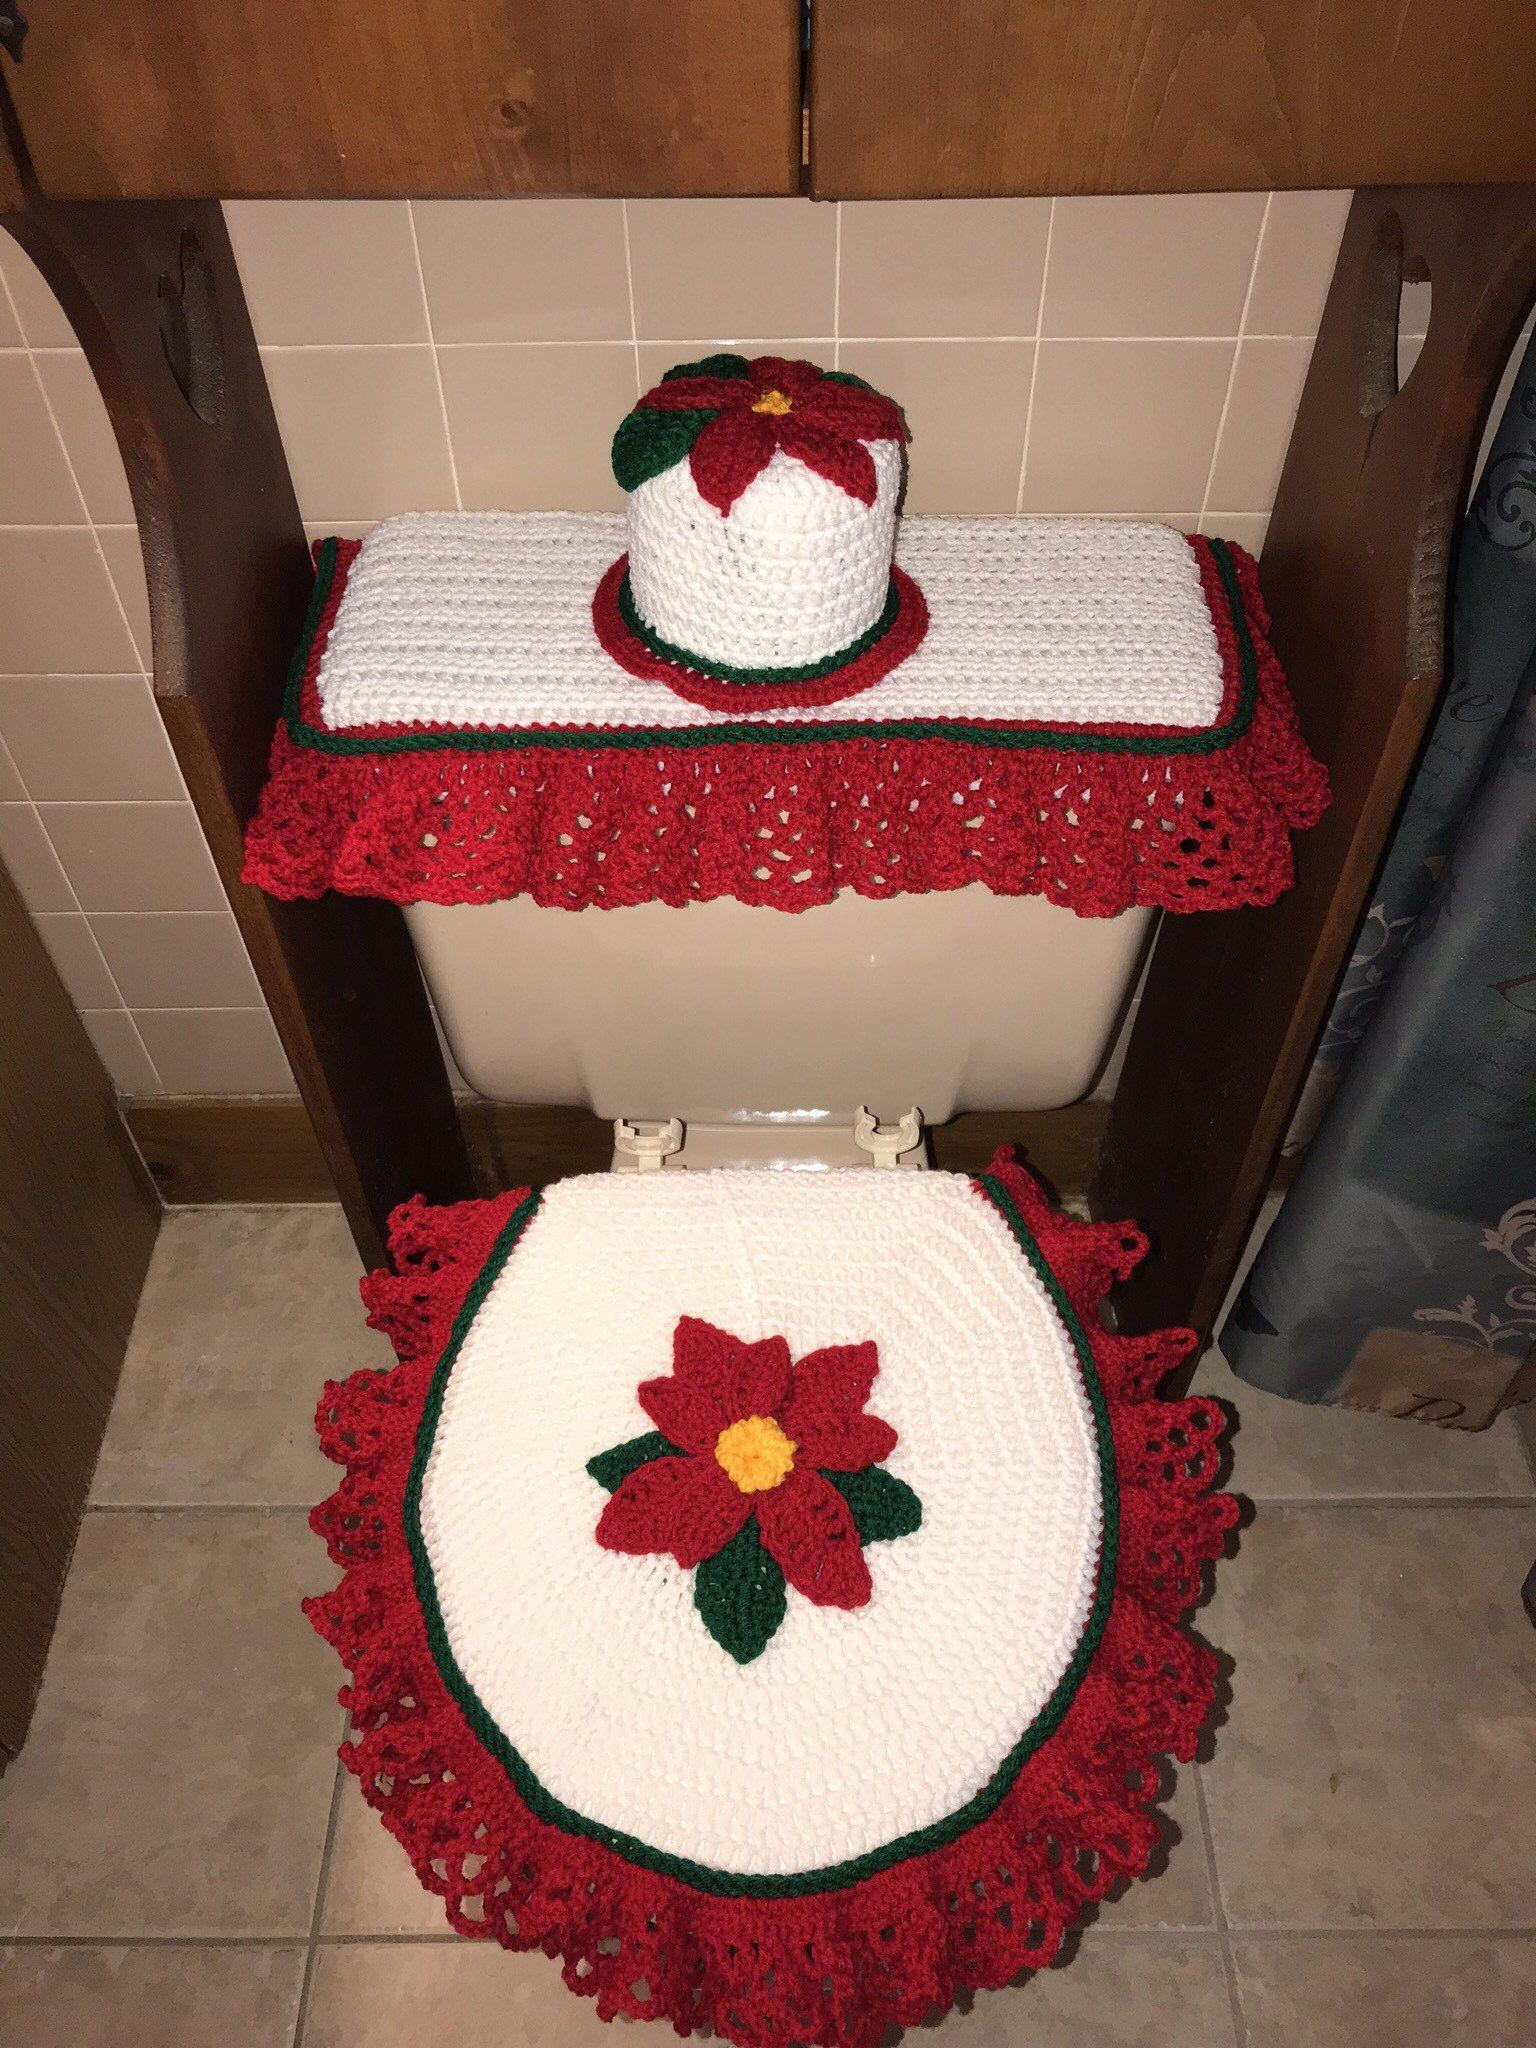 Christmas crochet bathroom toilet cover set  Toilet covers